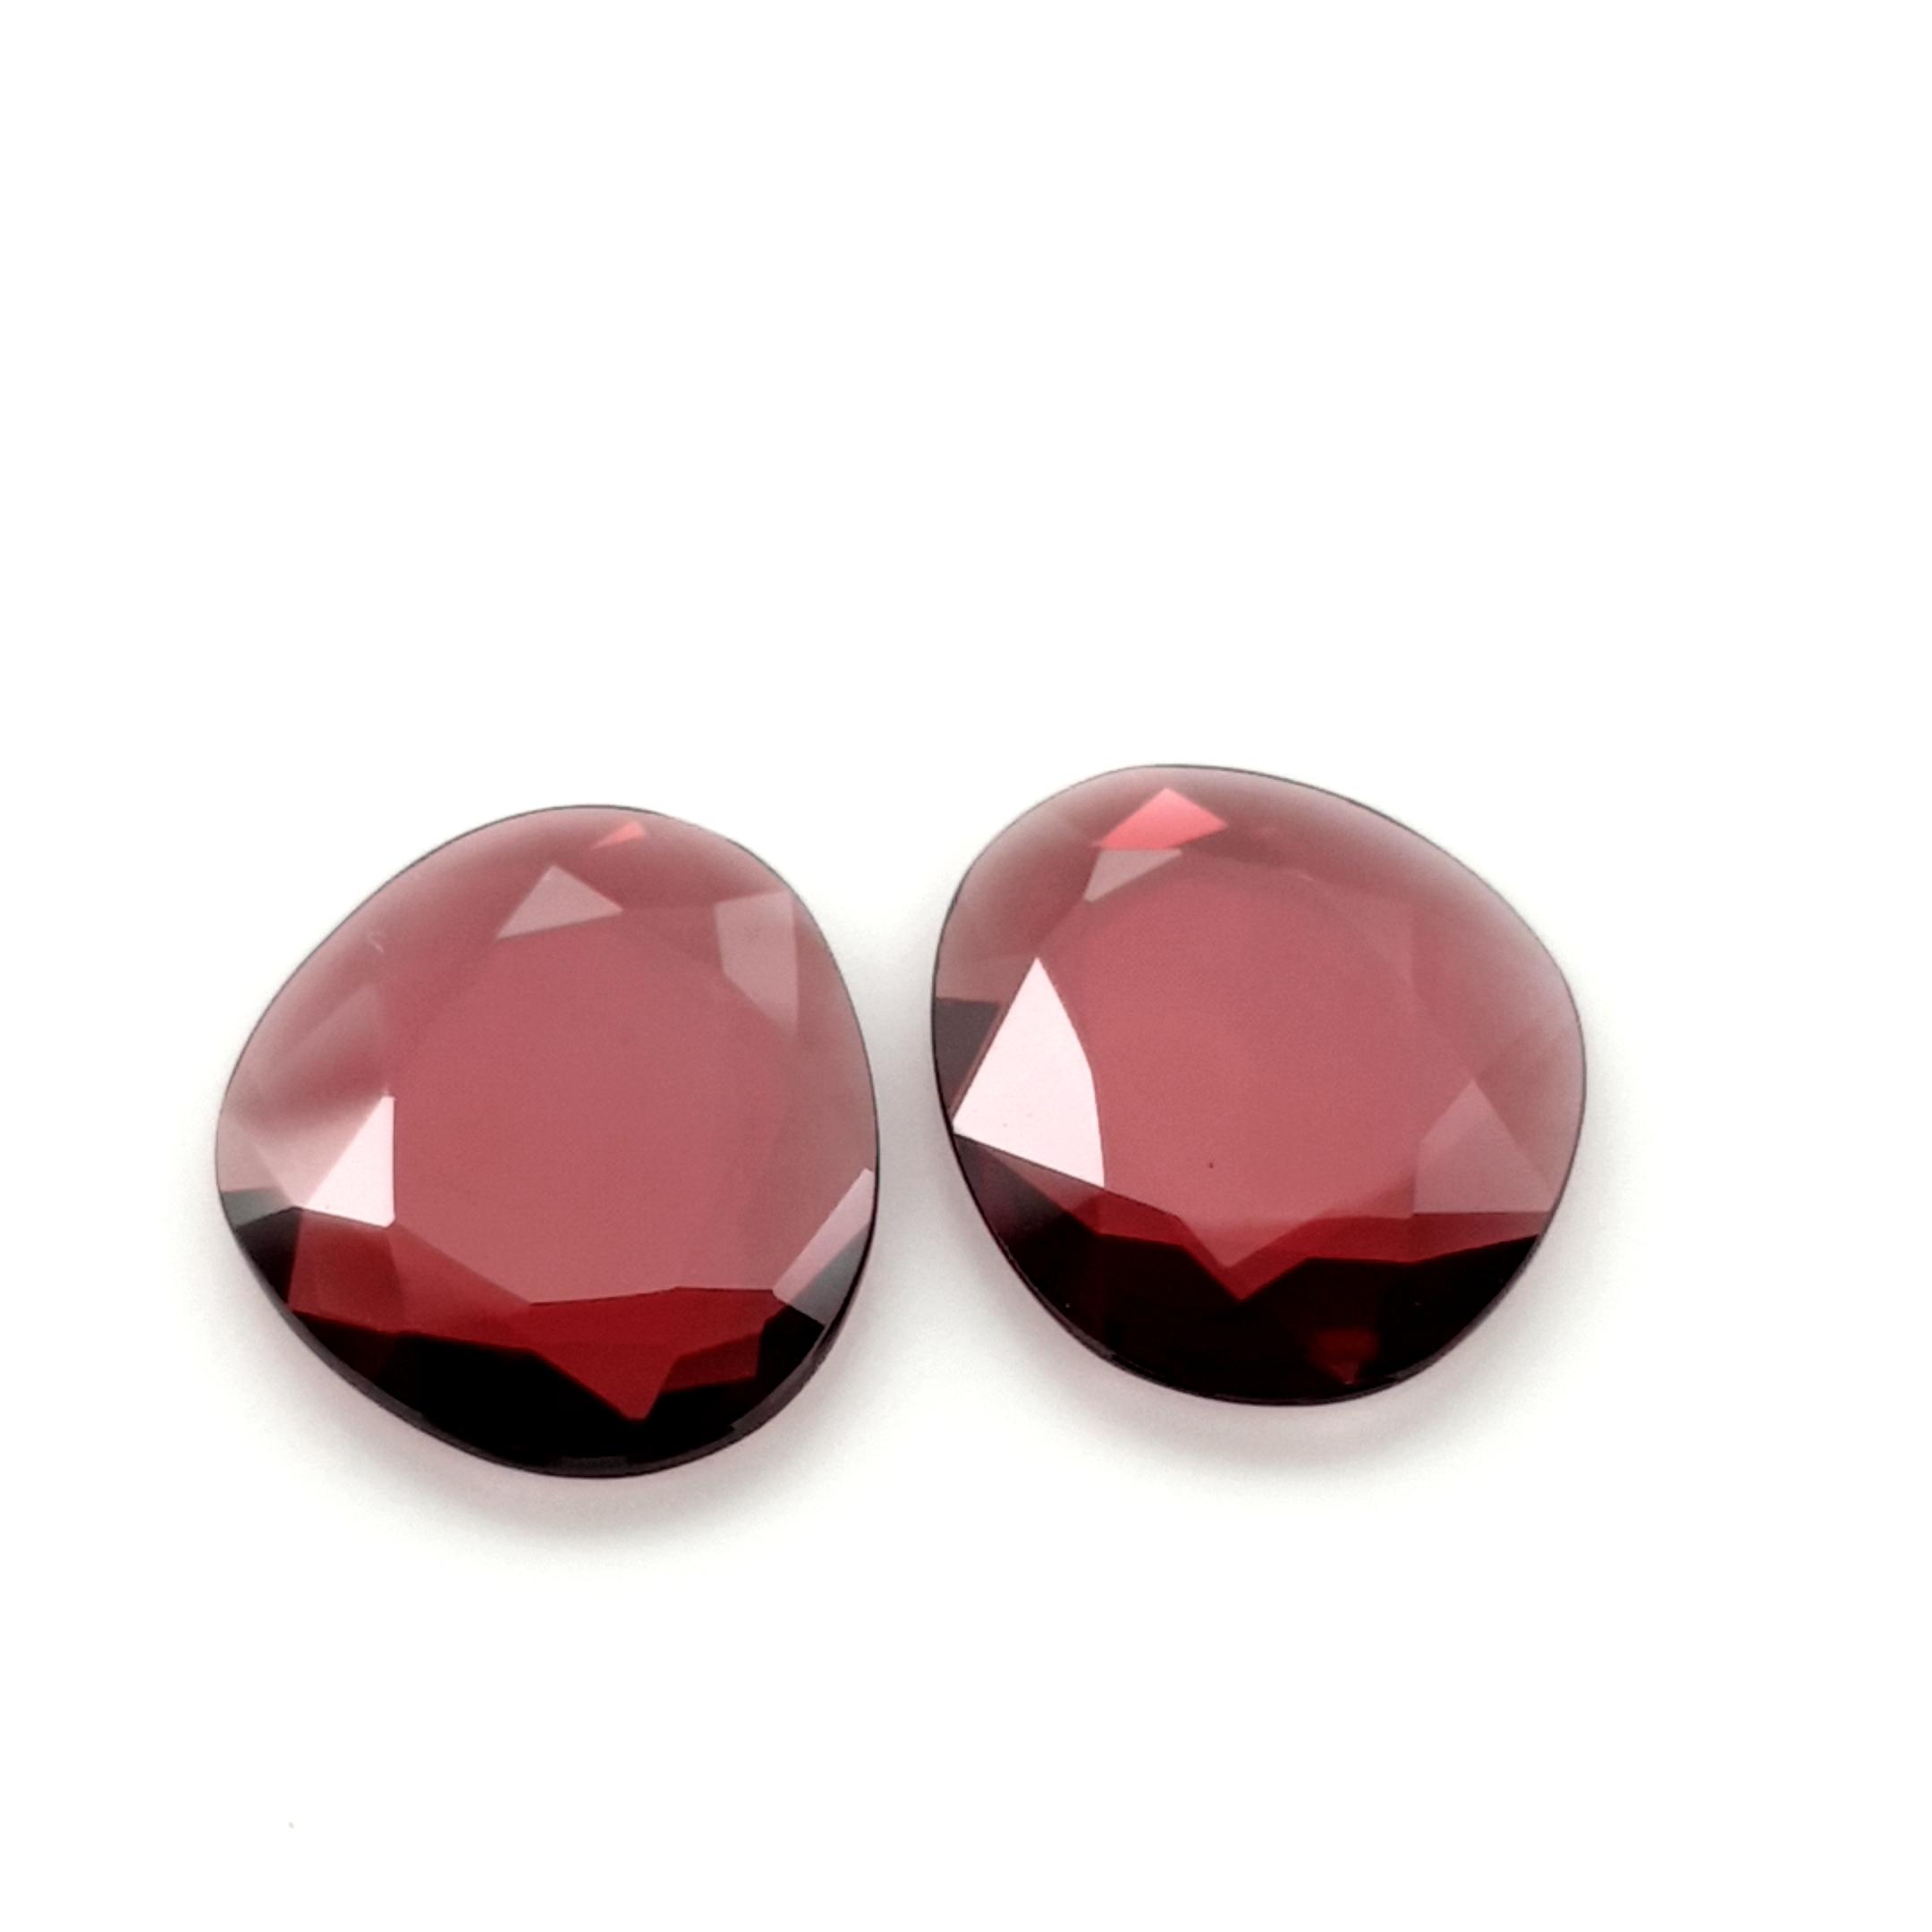 10,18ct. Pair Rhodolite Garnet DoubleRoseCut GRD19C1 ClaudiaHamann__2021-02-28-18-44-19